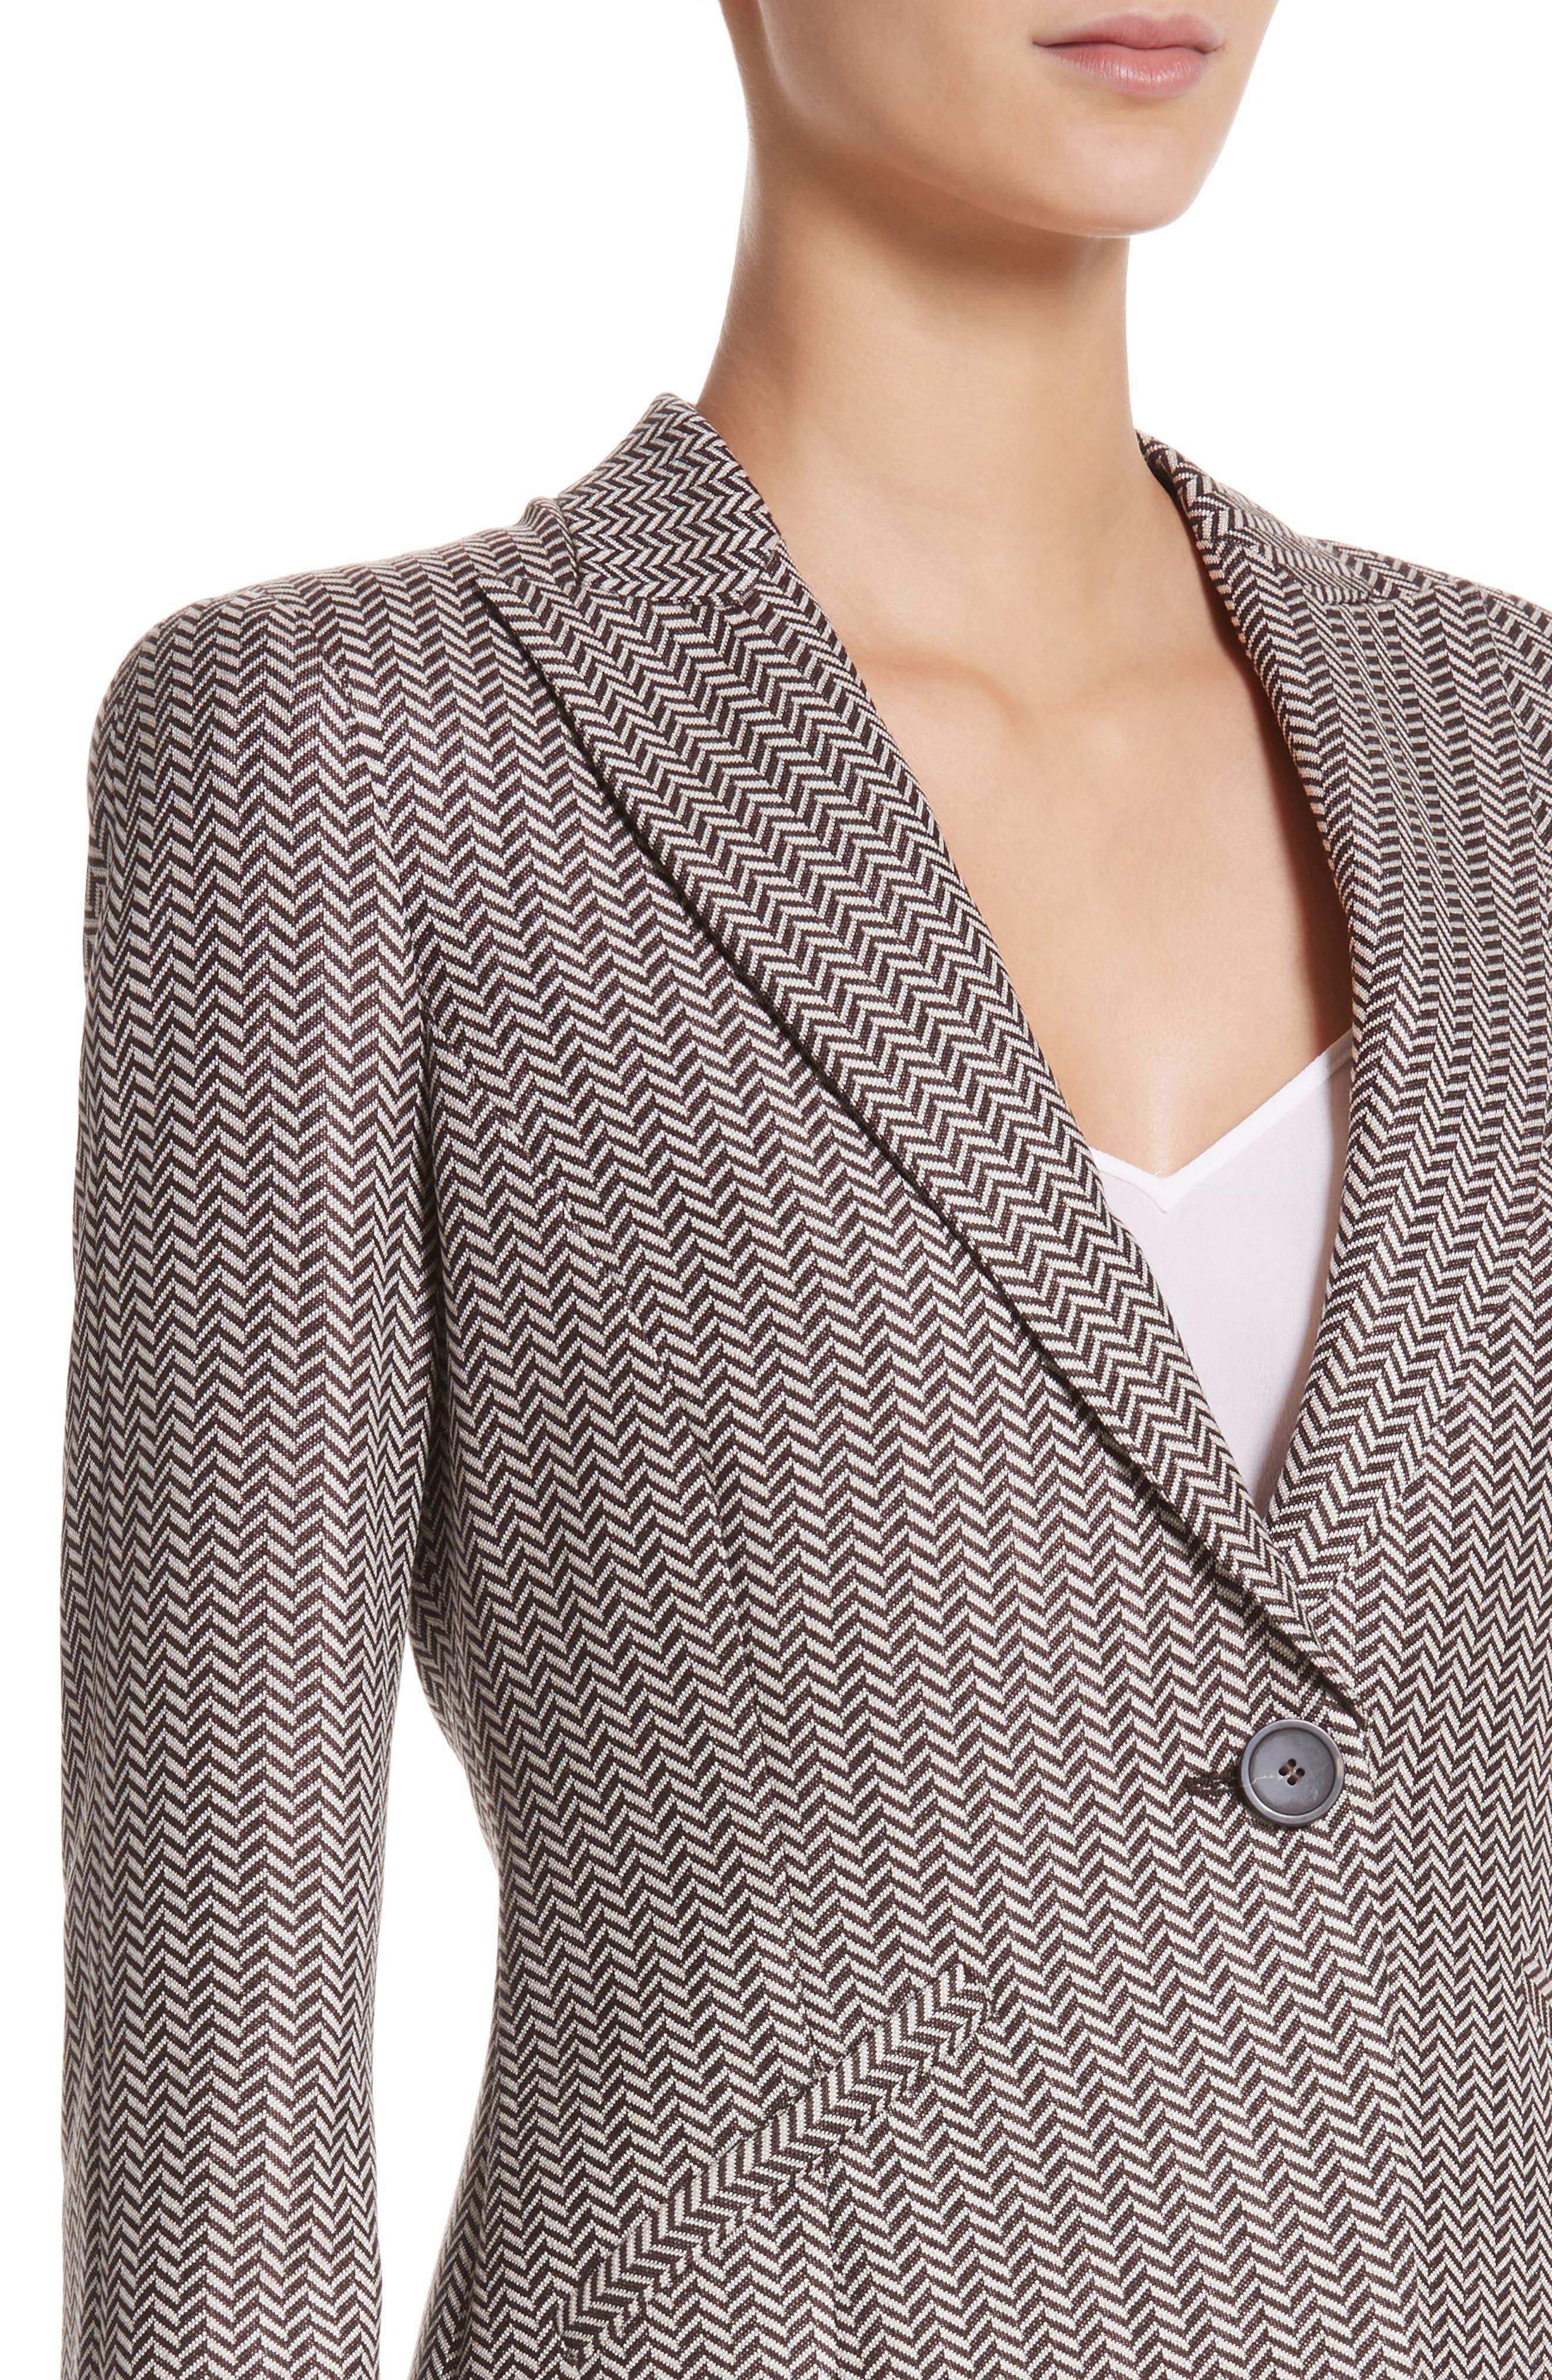 Alternate Image 4  - Armani Collezioni Mini Herringbone Jacket